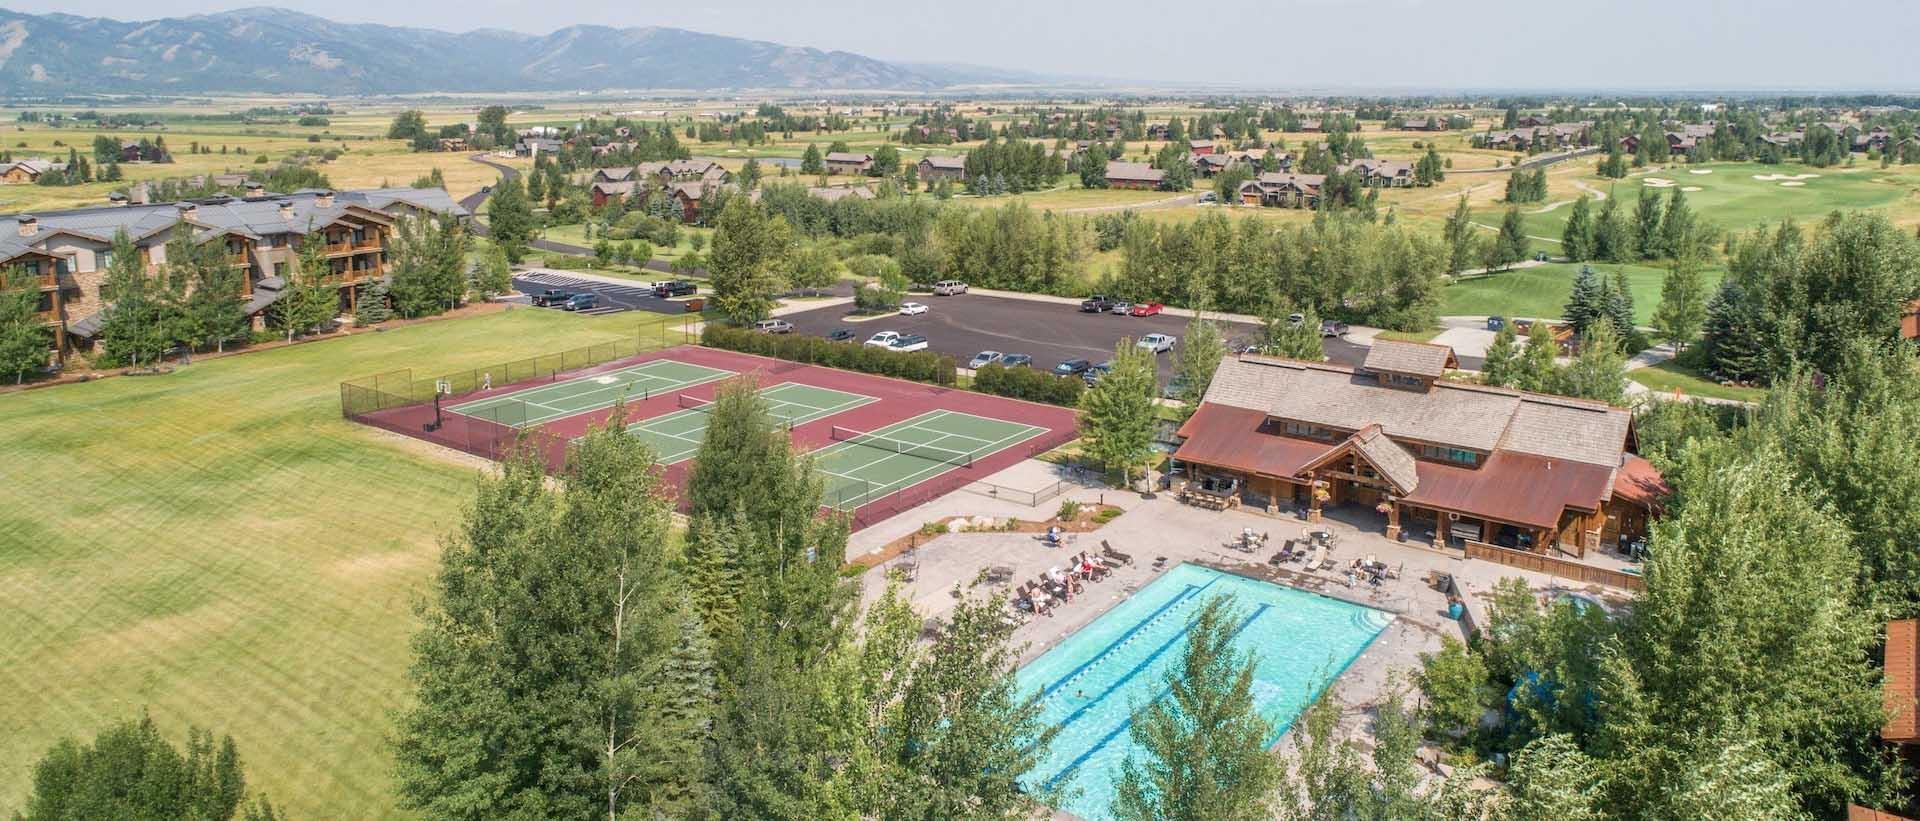 Teton Springs Lodge - Hotel - Victor Idaho